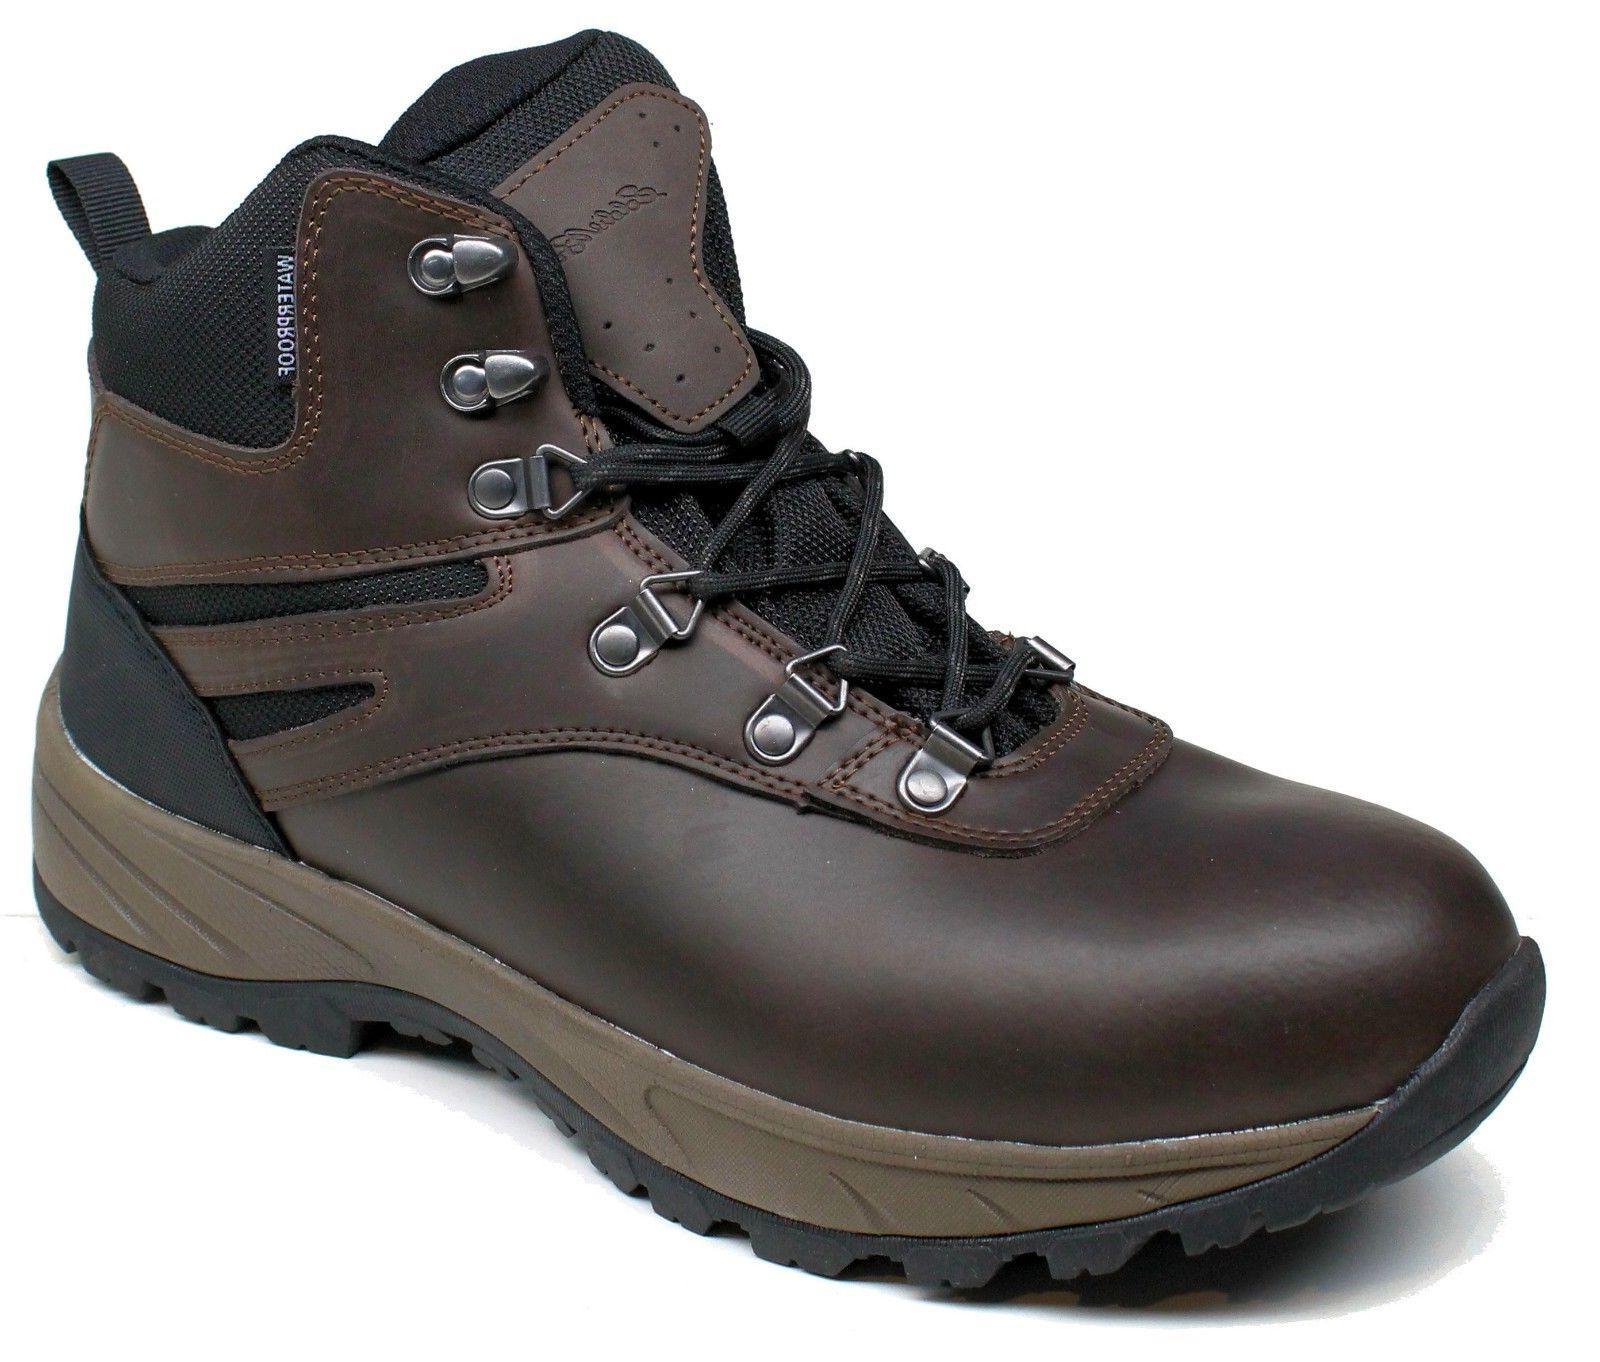 everett leather 100 percent waterproof hiking boots